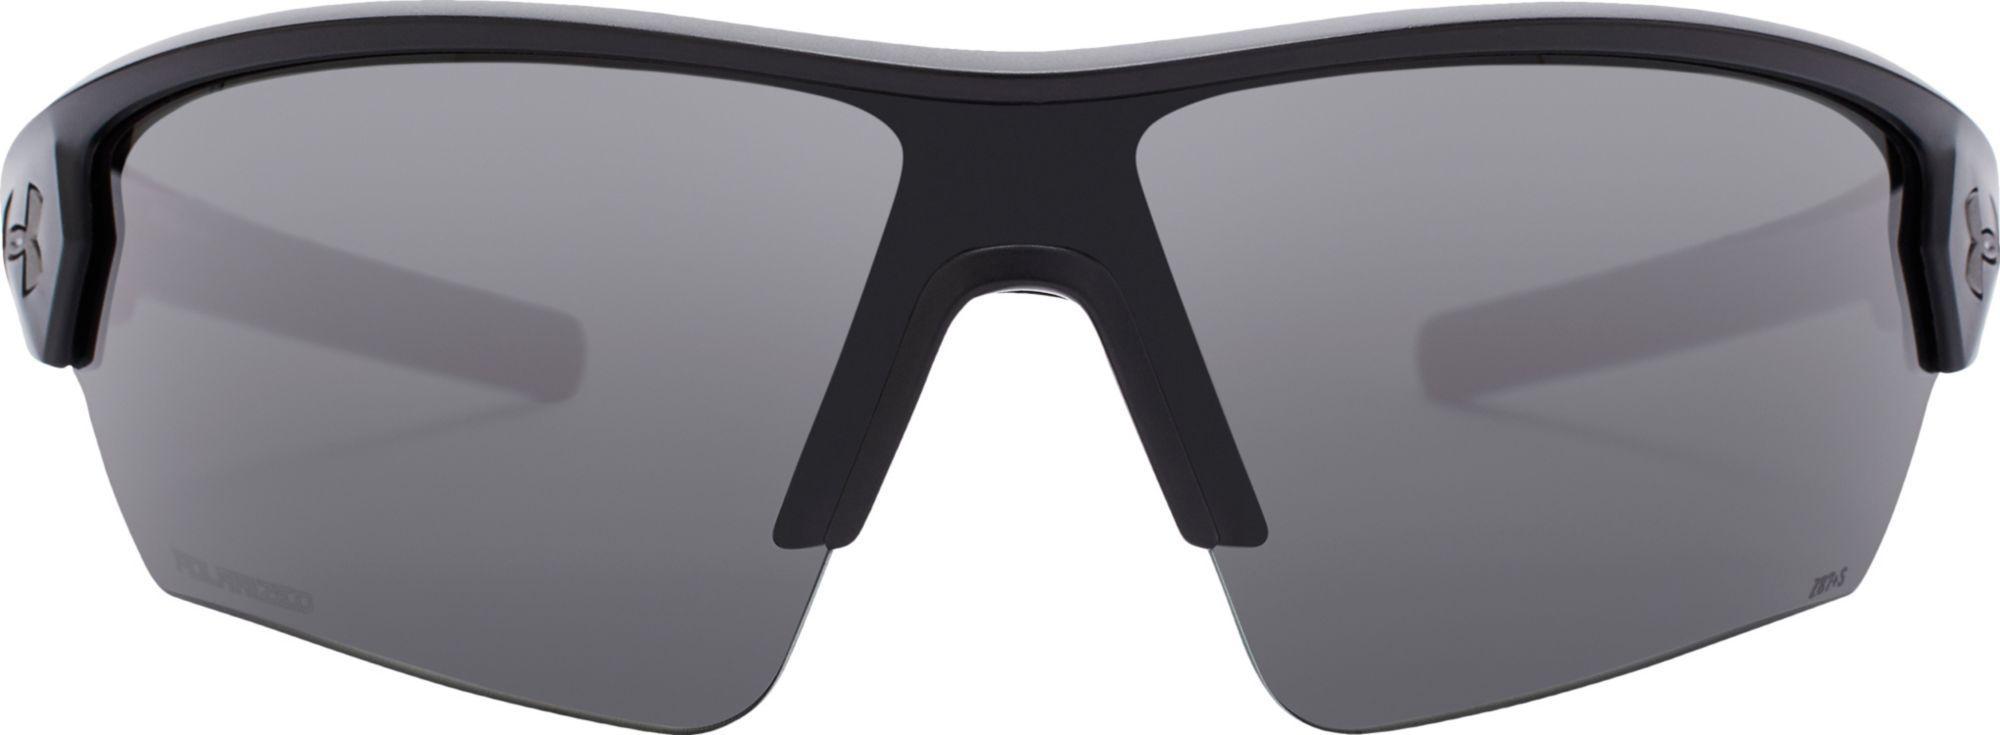 467fc7074d Under Armour - Black Rival Storm Polarized Sunglasses for Men - Lyst. View  fullscreen